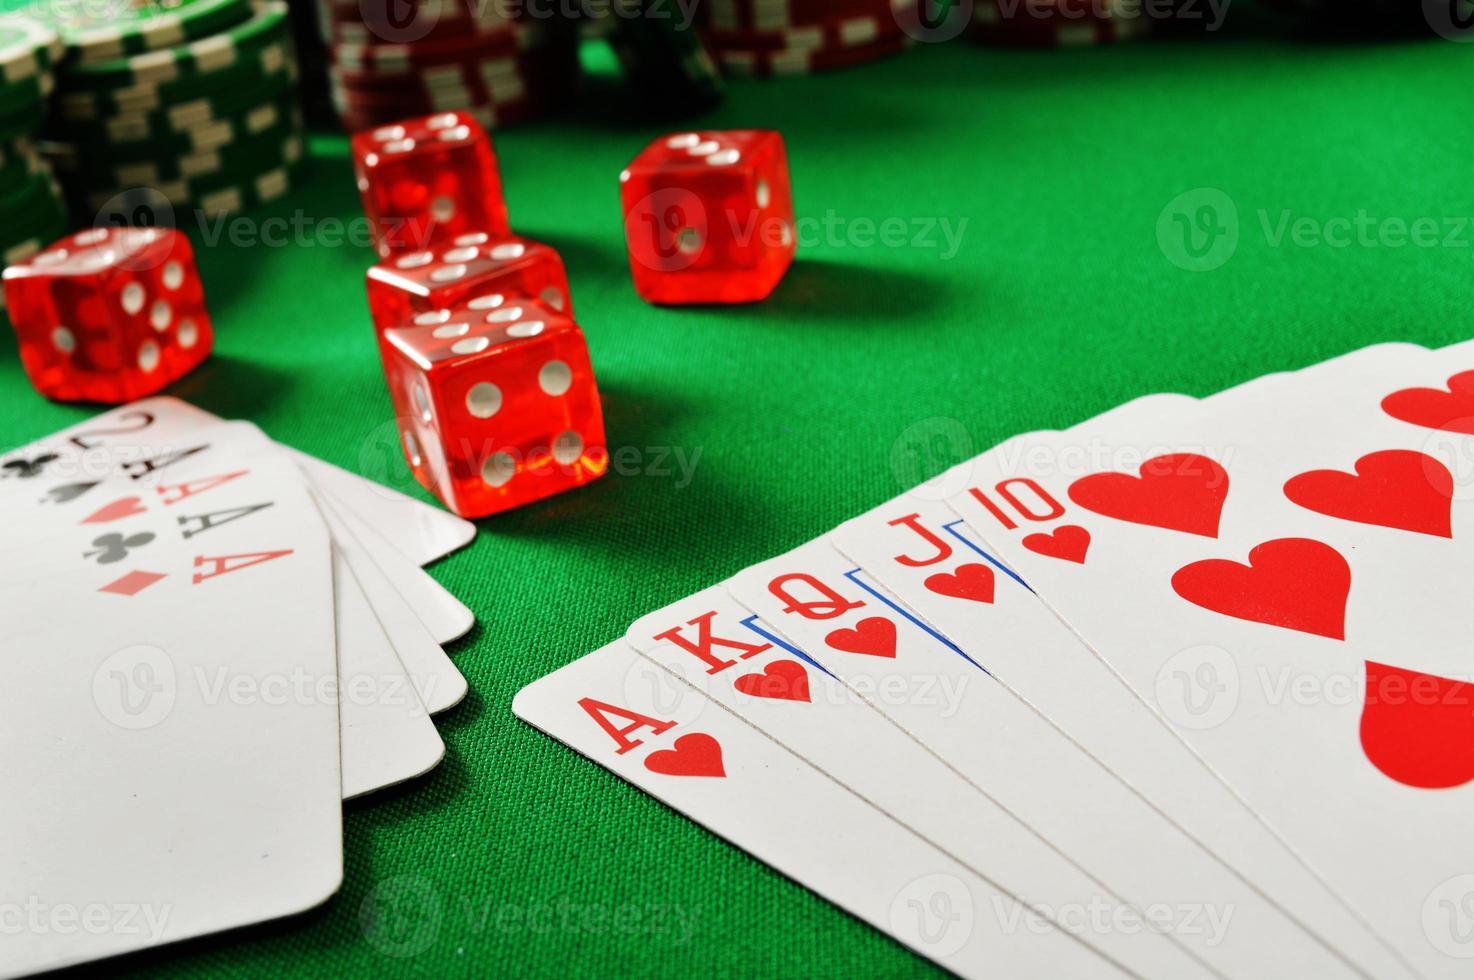 samenstelling met speelkaarten op groene tafel foto